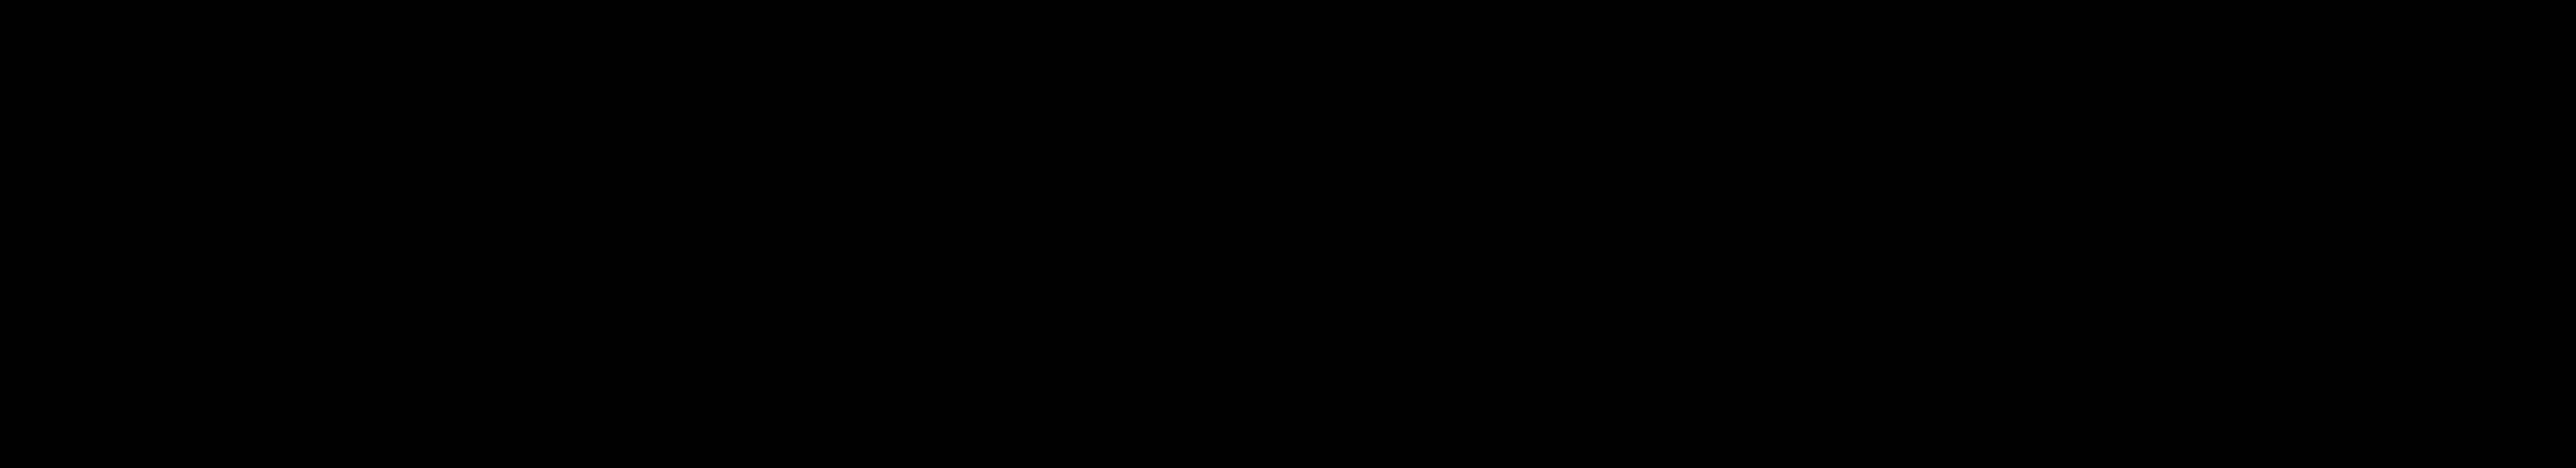 BUNS RECORDS pre Atomic Skipper  「解放宣言」 SideChest 「Prima」 Release Party